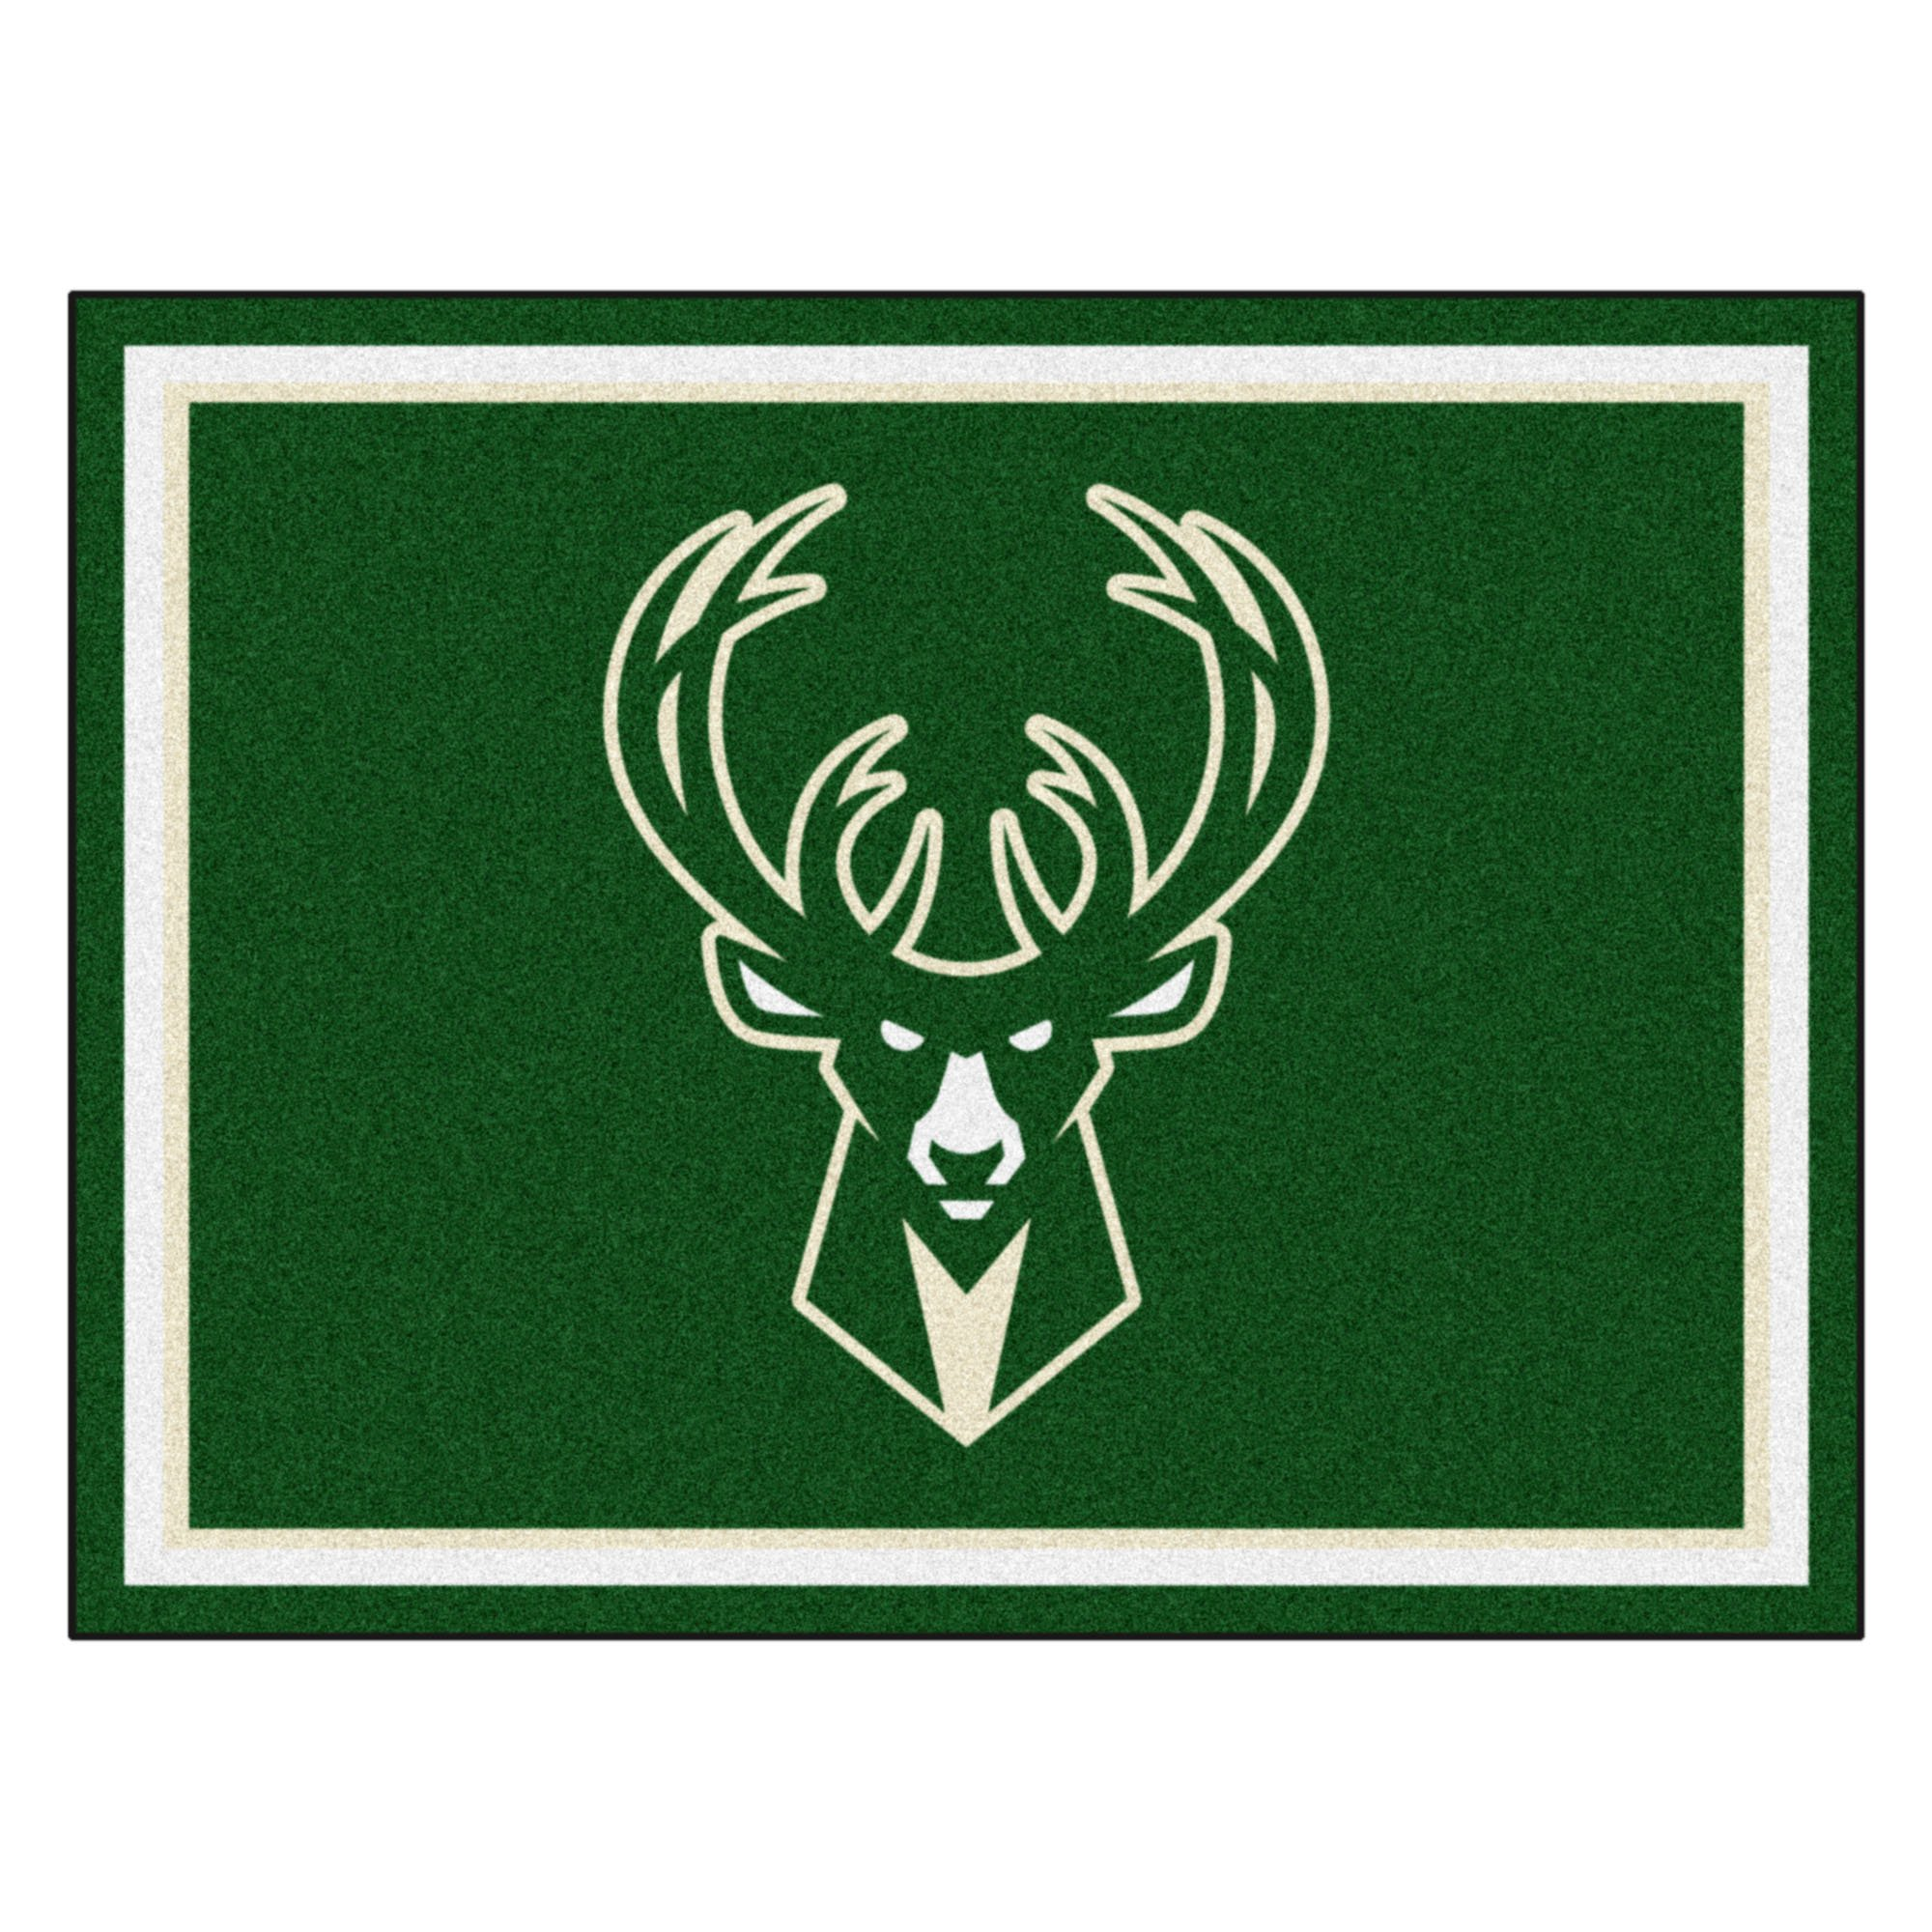 FANMATS 17458 NBA Milwaukee Bucks Rug